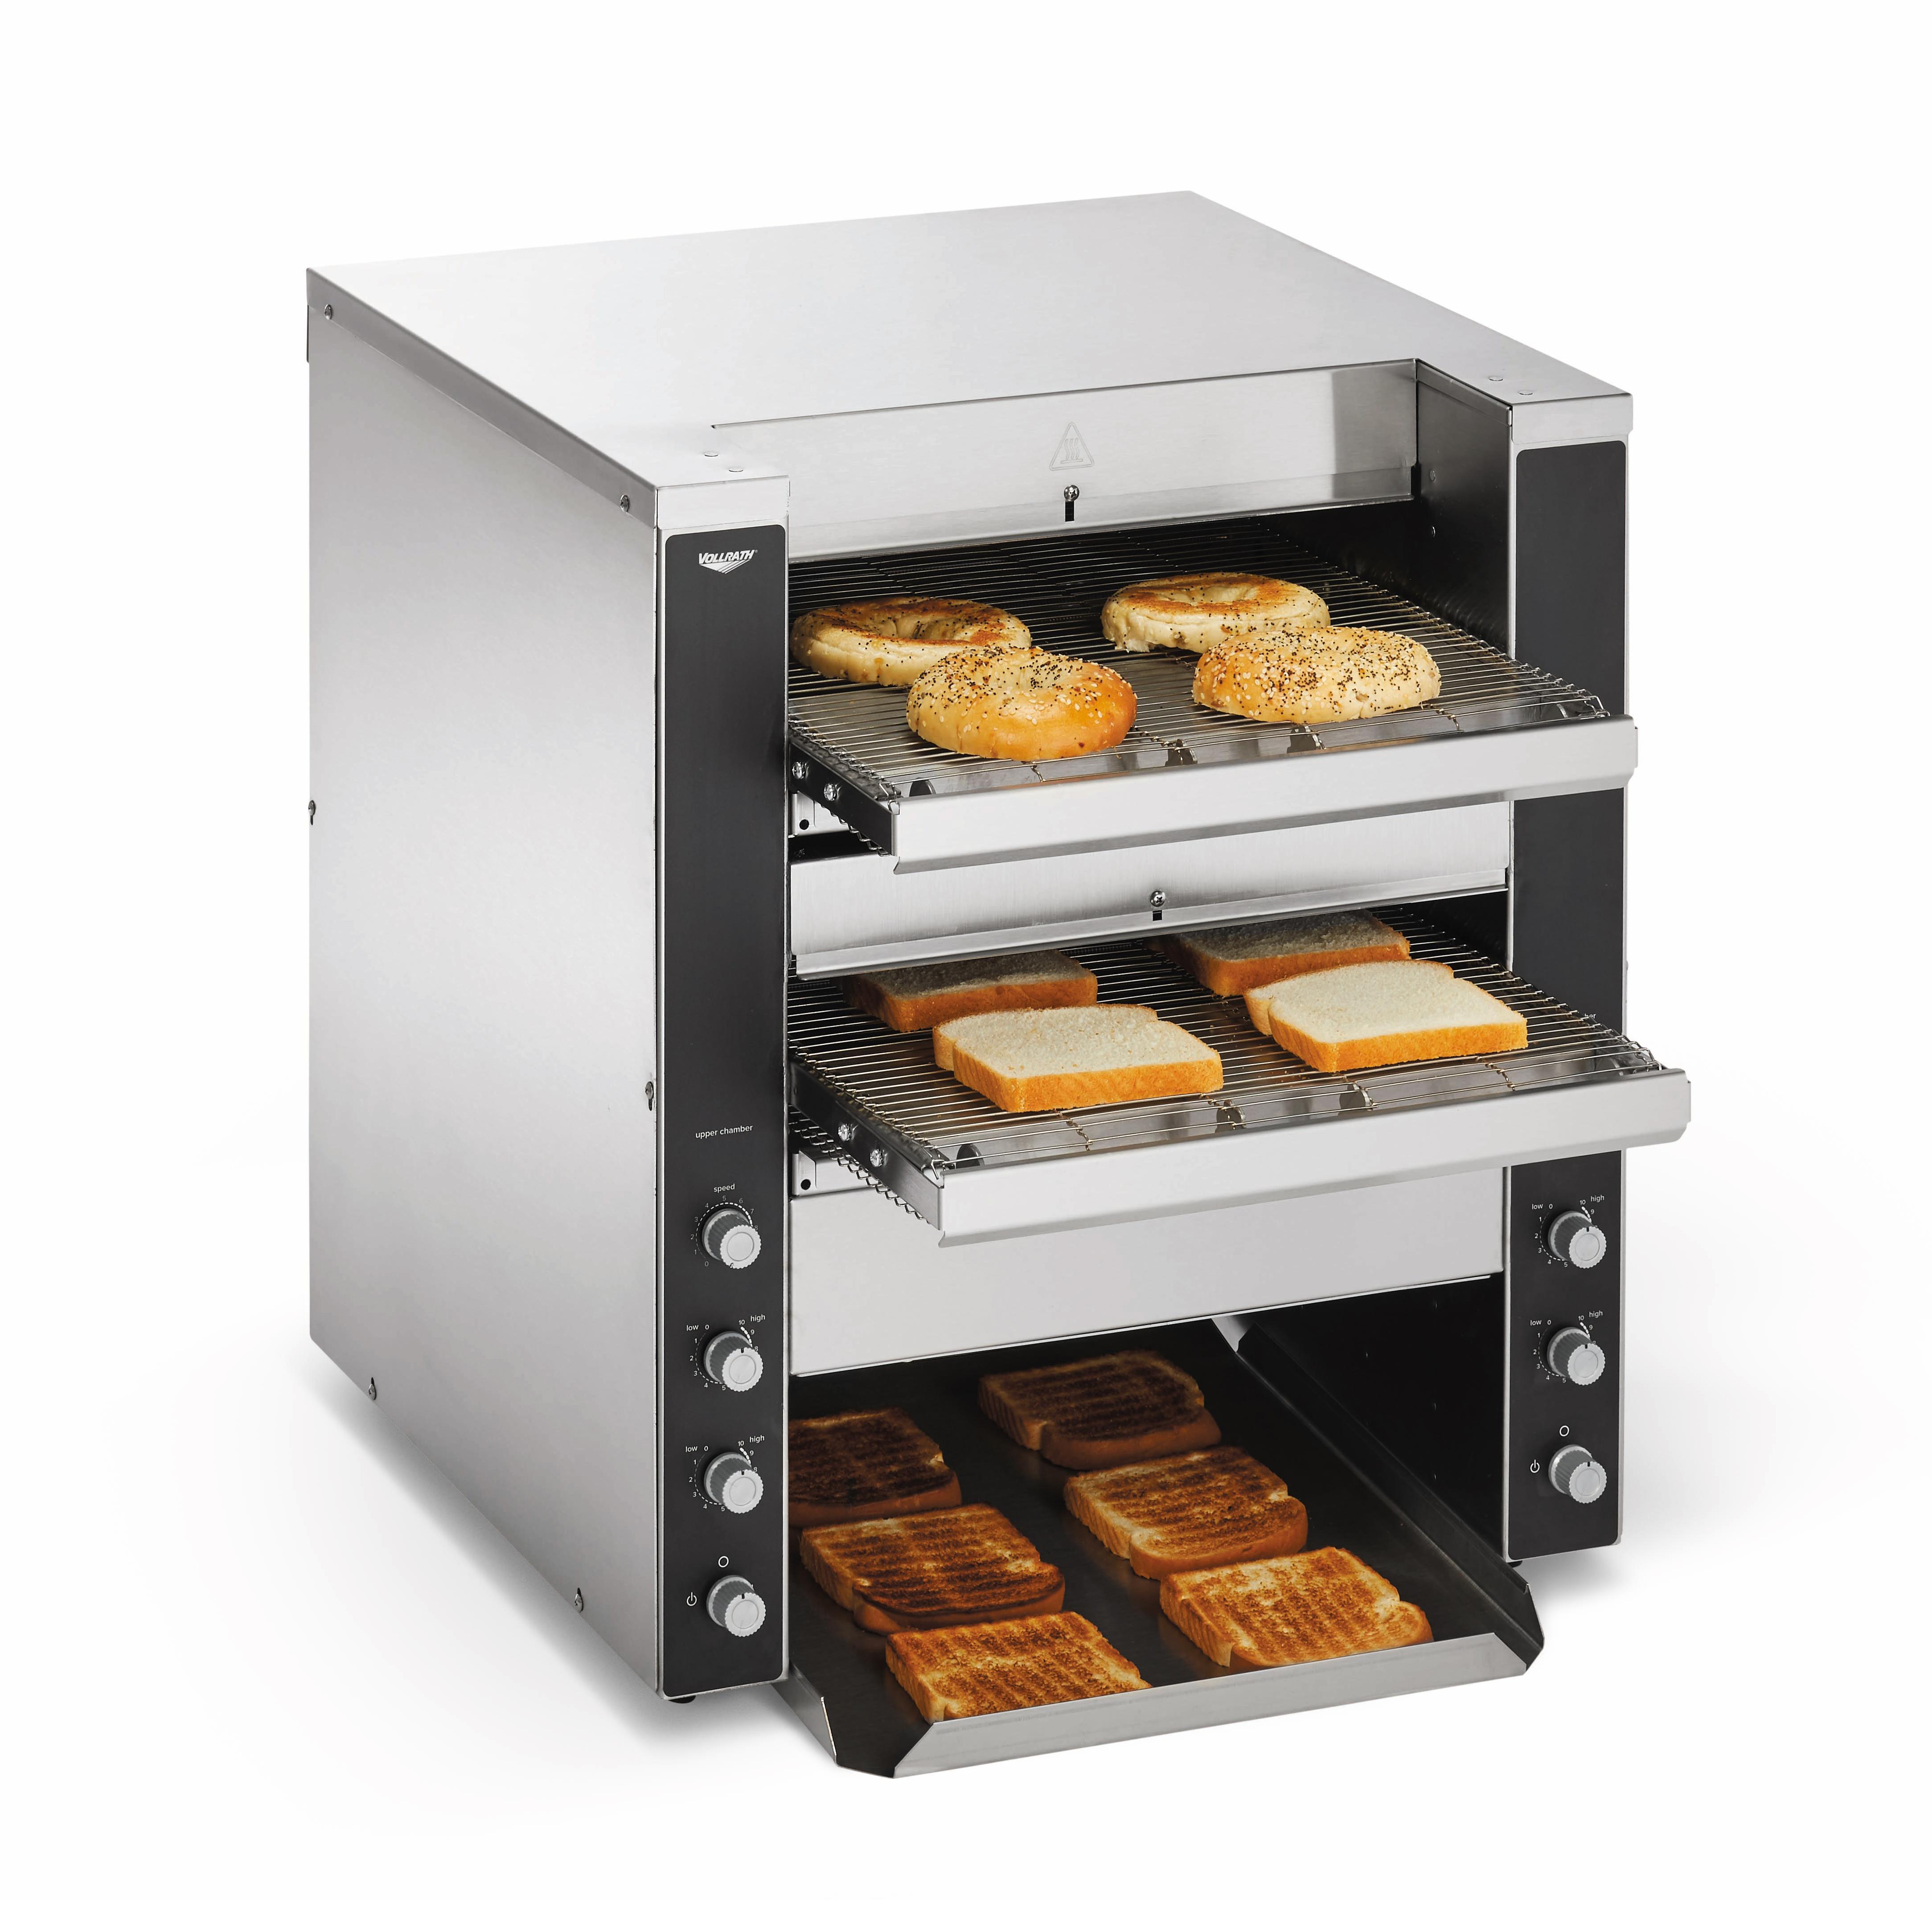 Vollrath CVT4-208DUAL toaster, conveyor type